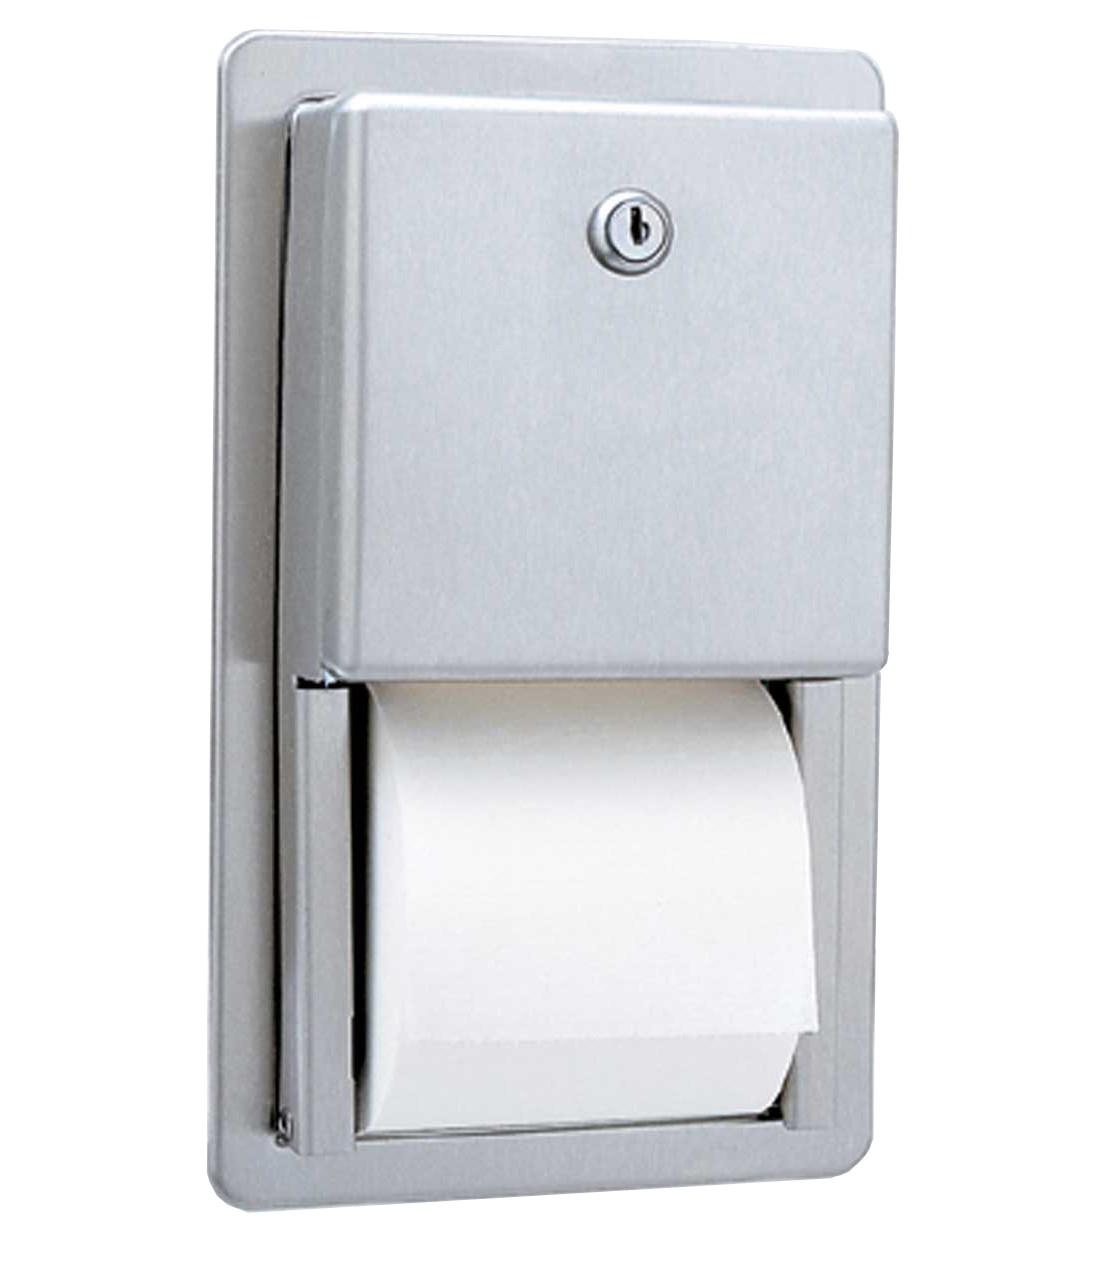 Bobrick Recessed Multi Roll Toilet Tissue Dispenser